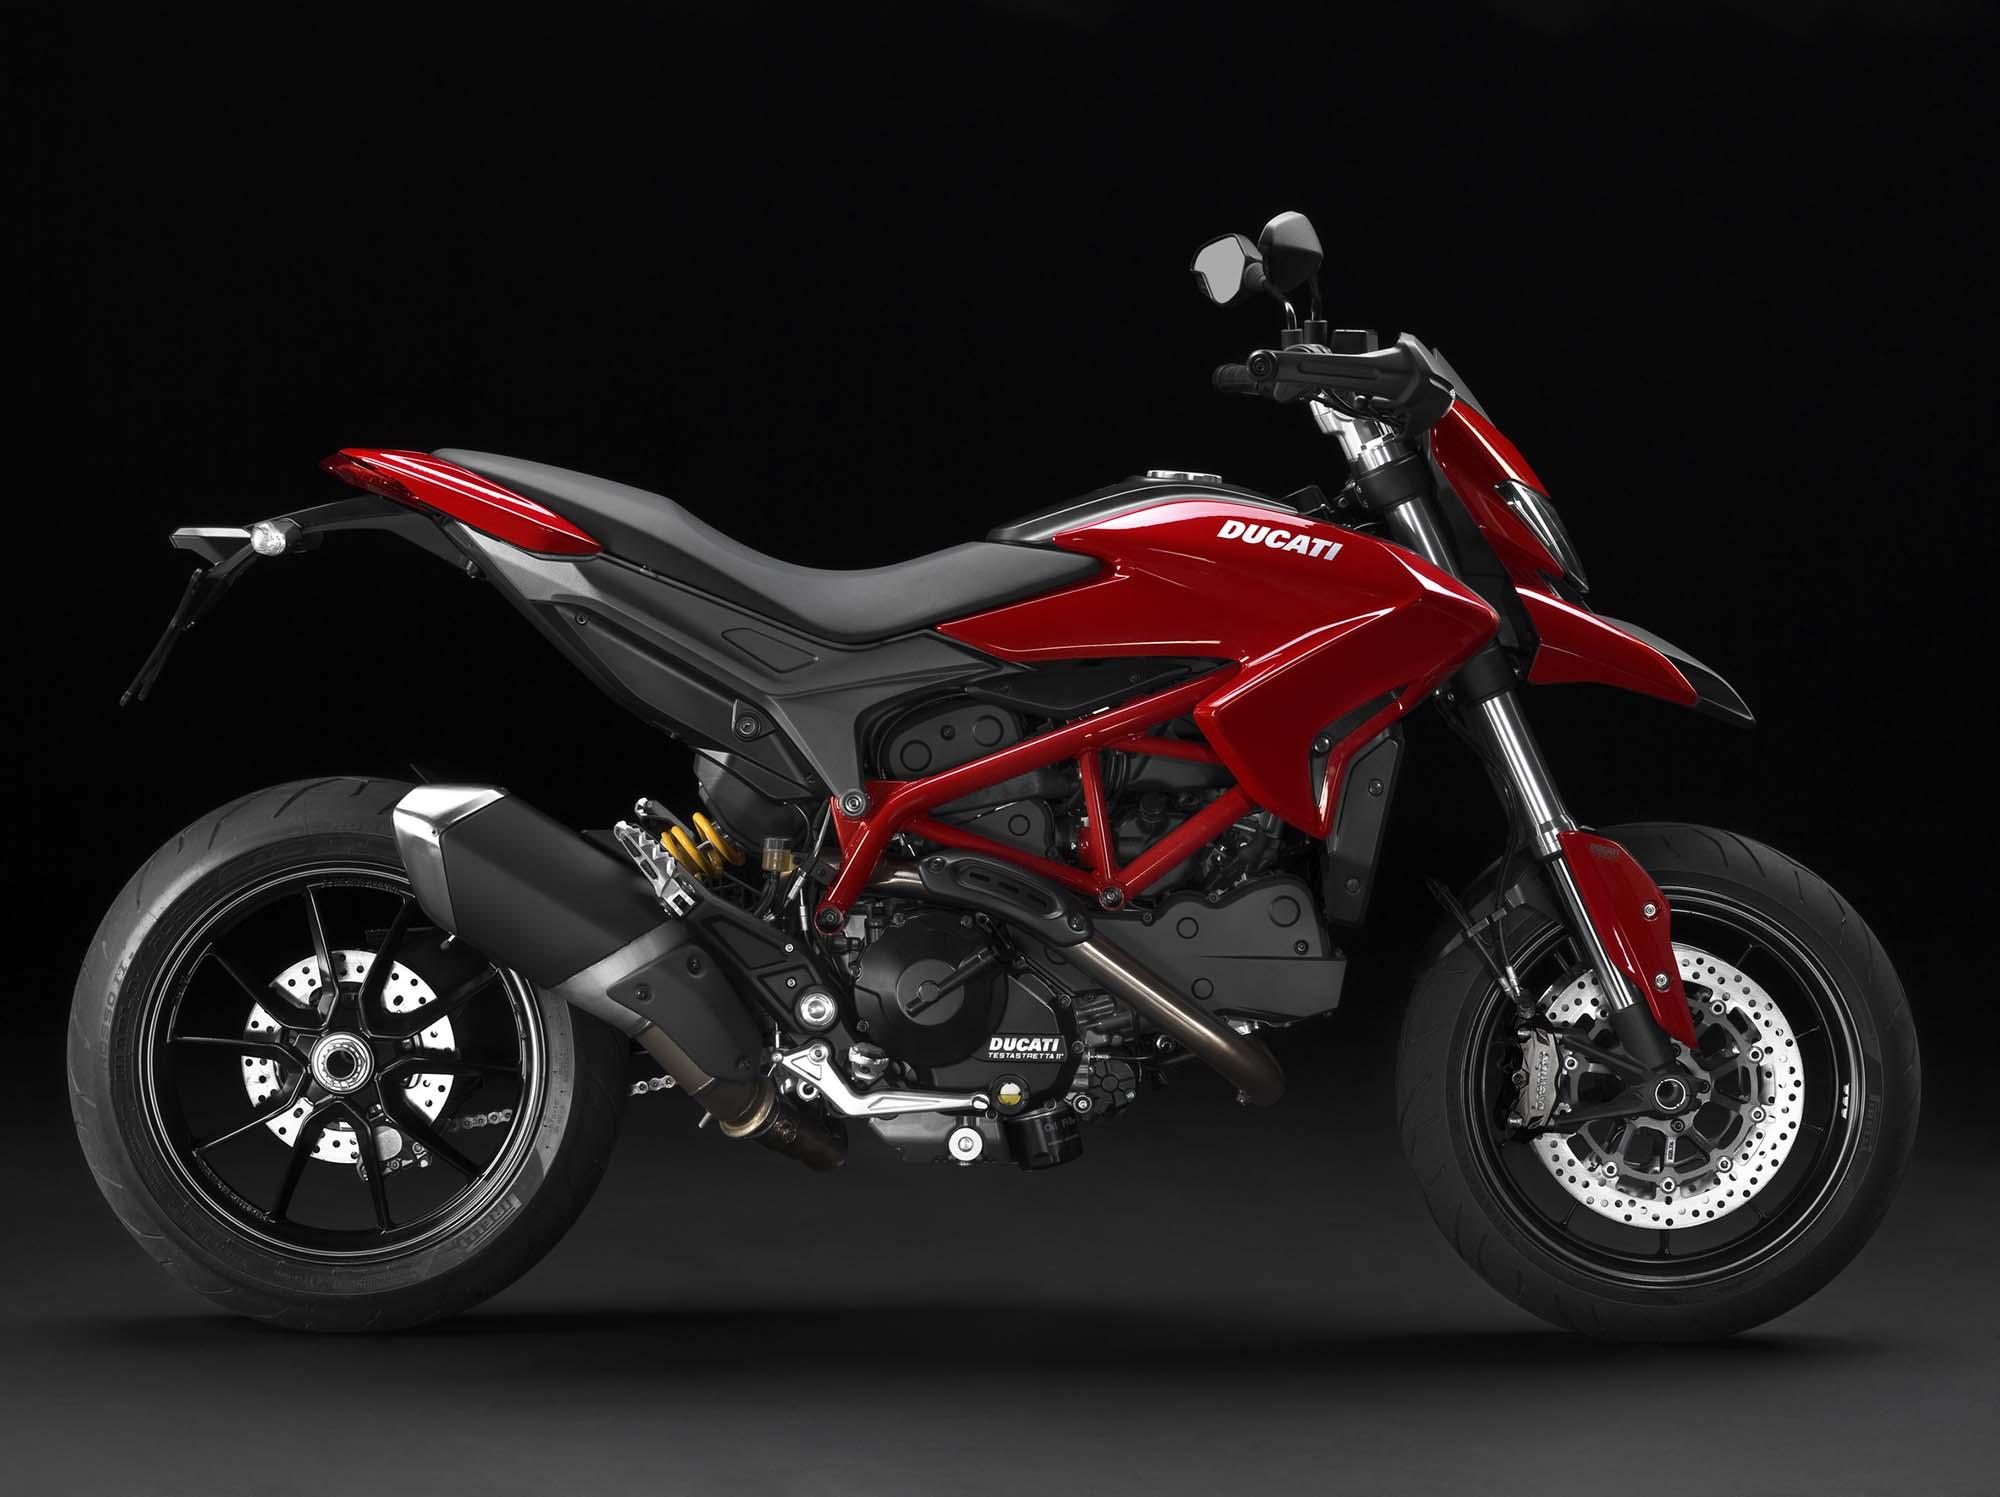 2013 Ducati Hypermotard - Makes More Tickets than Bieber ...